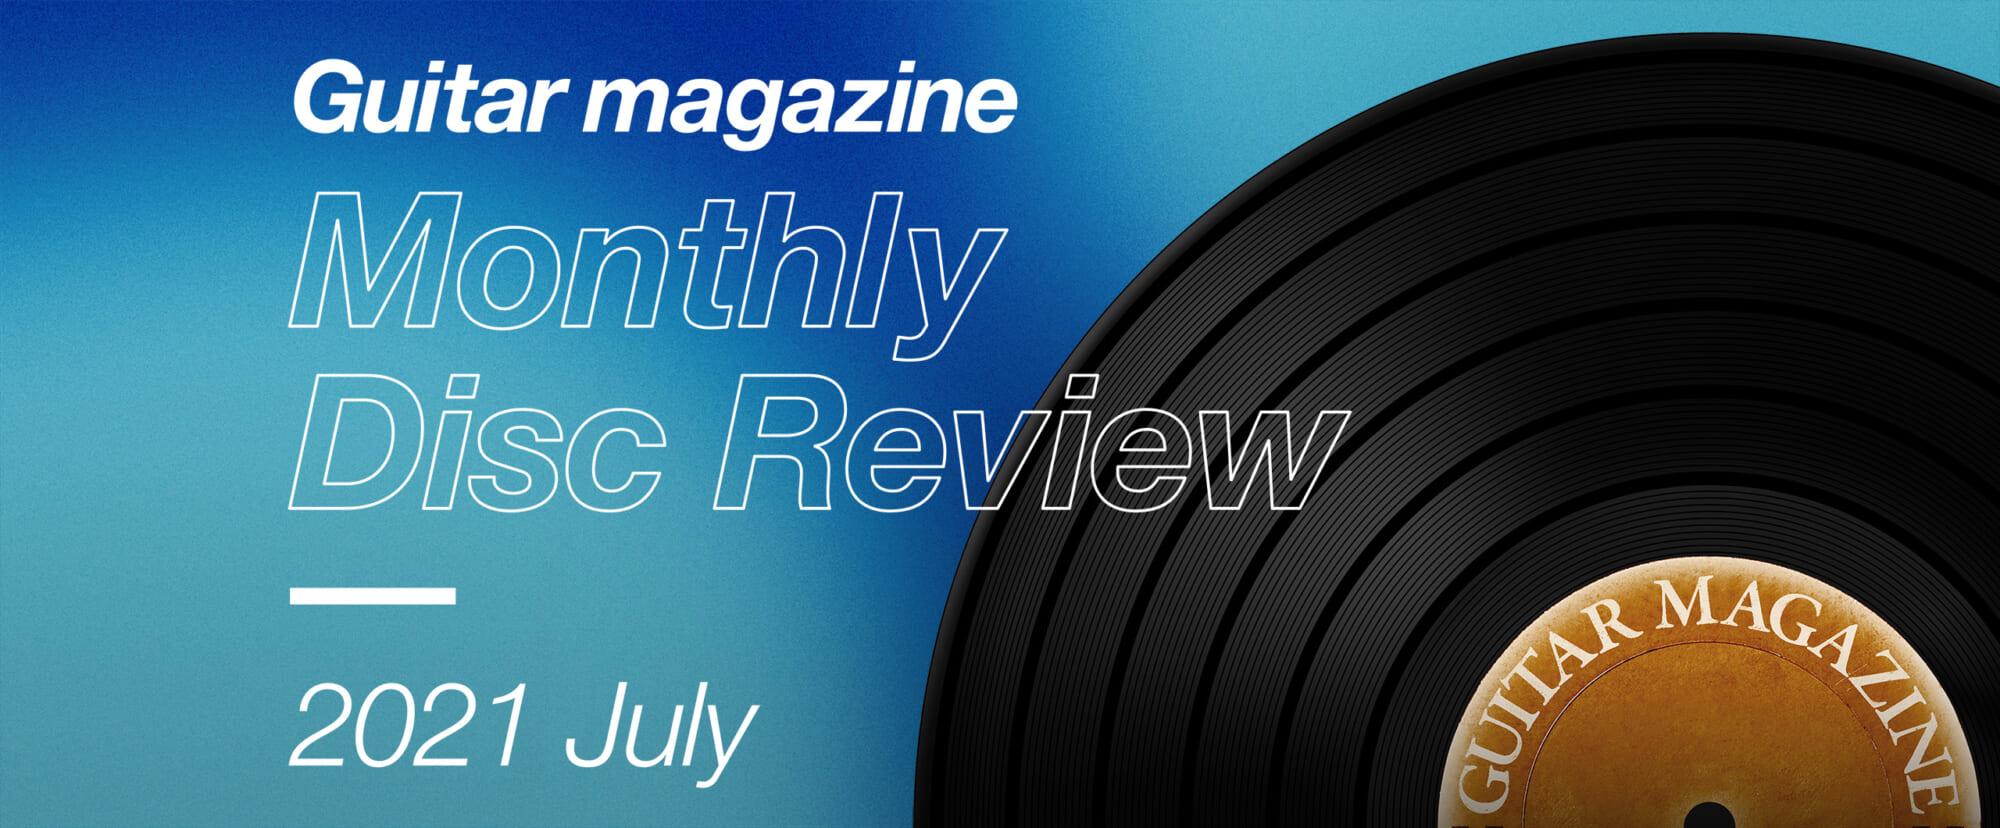 GM DISC REVIEW 2021 Julyギタマガおすすめの新譜をご紹介!